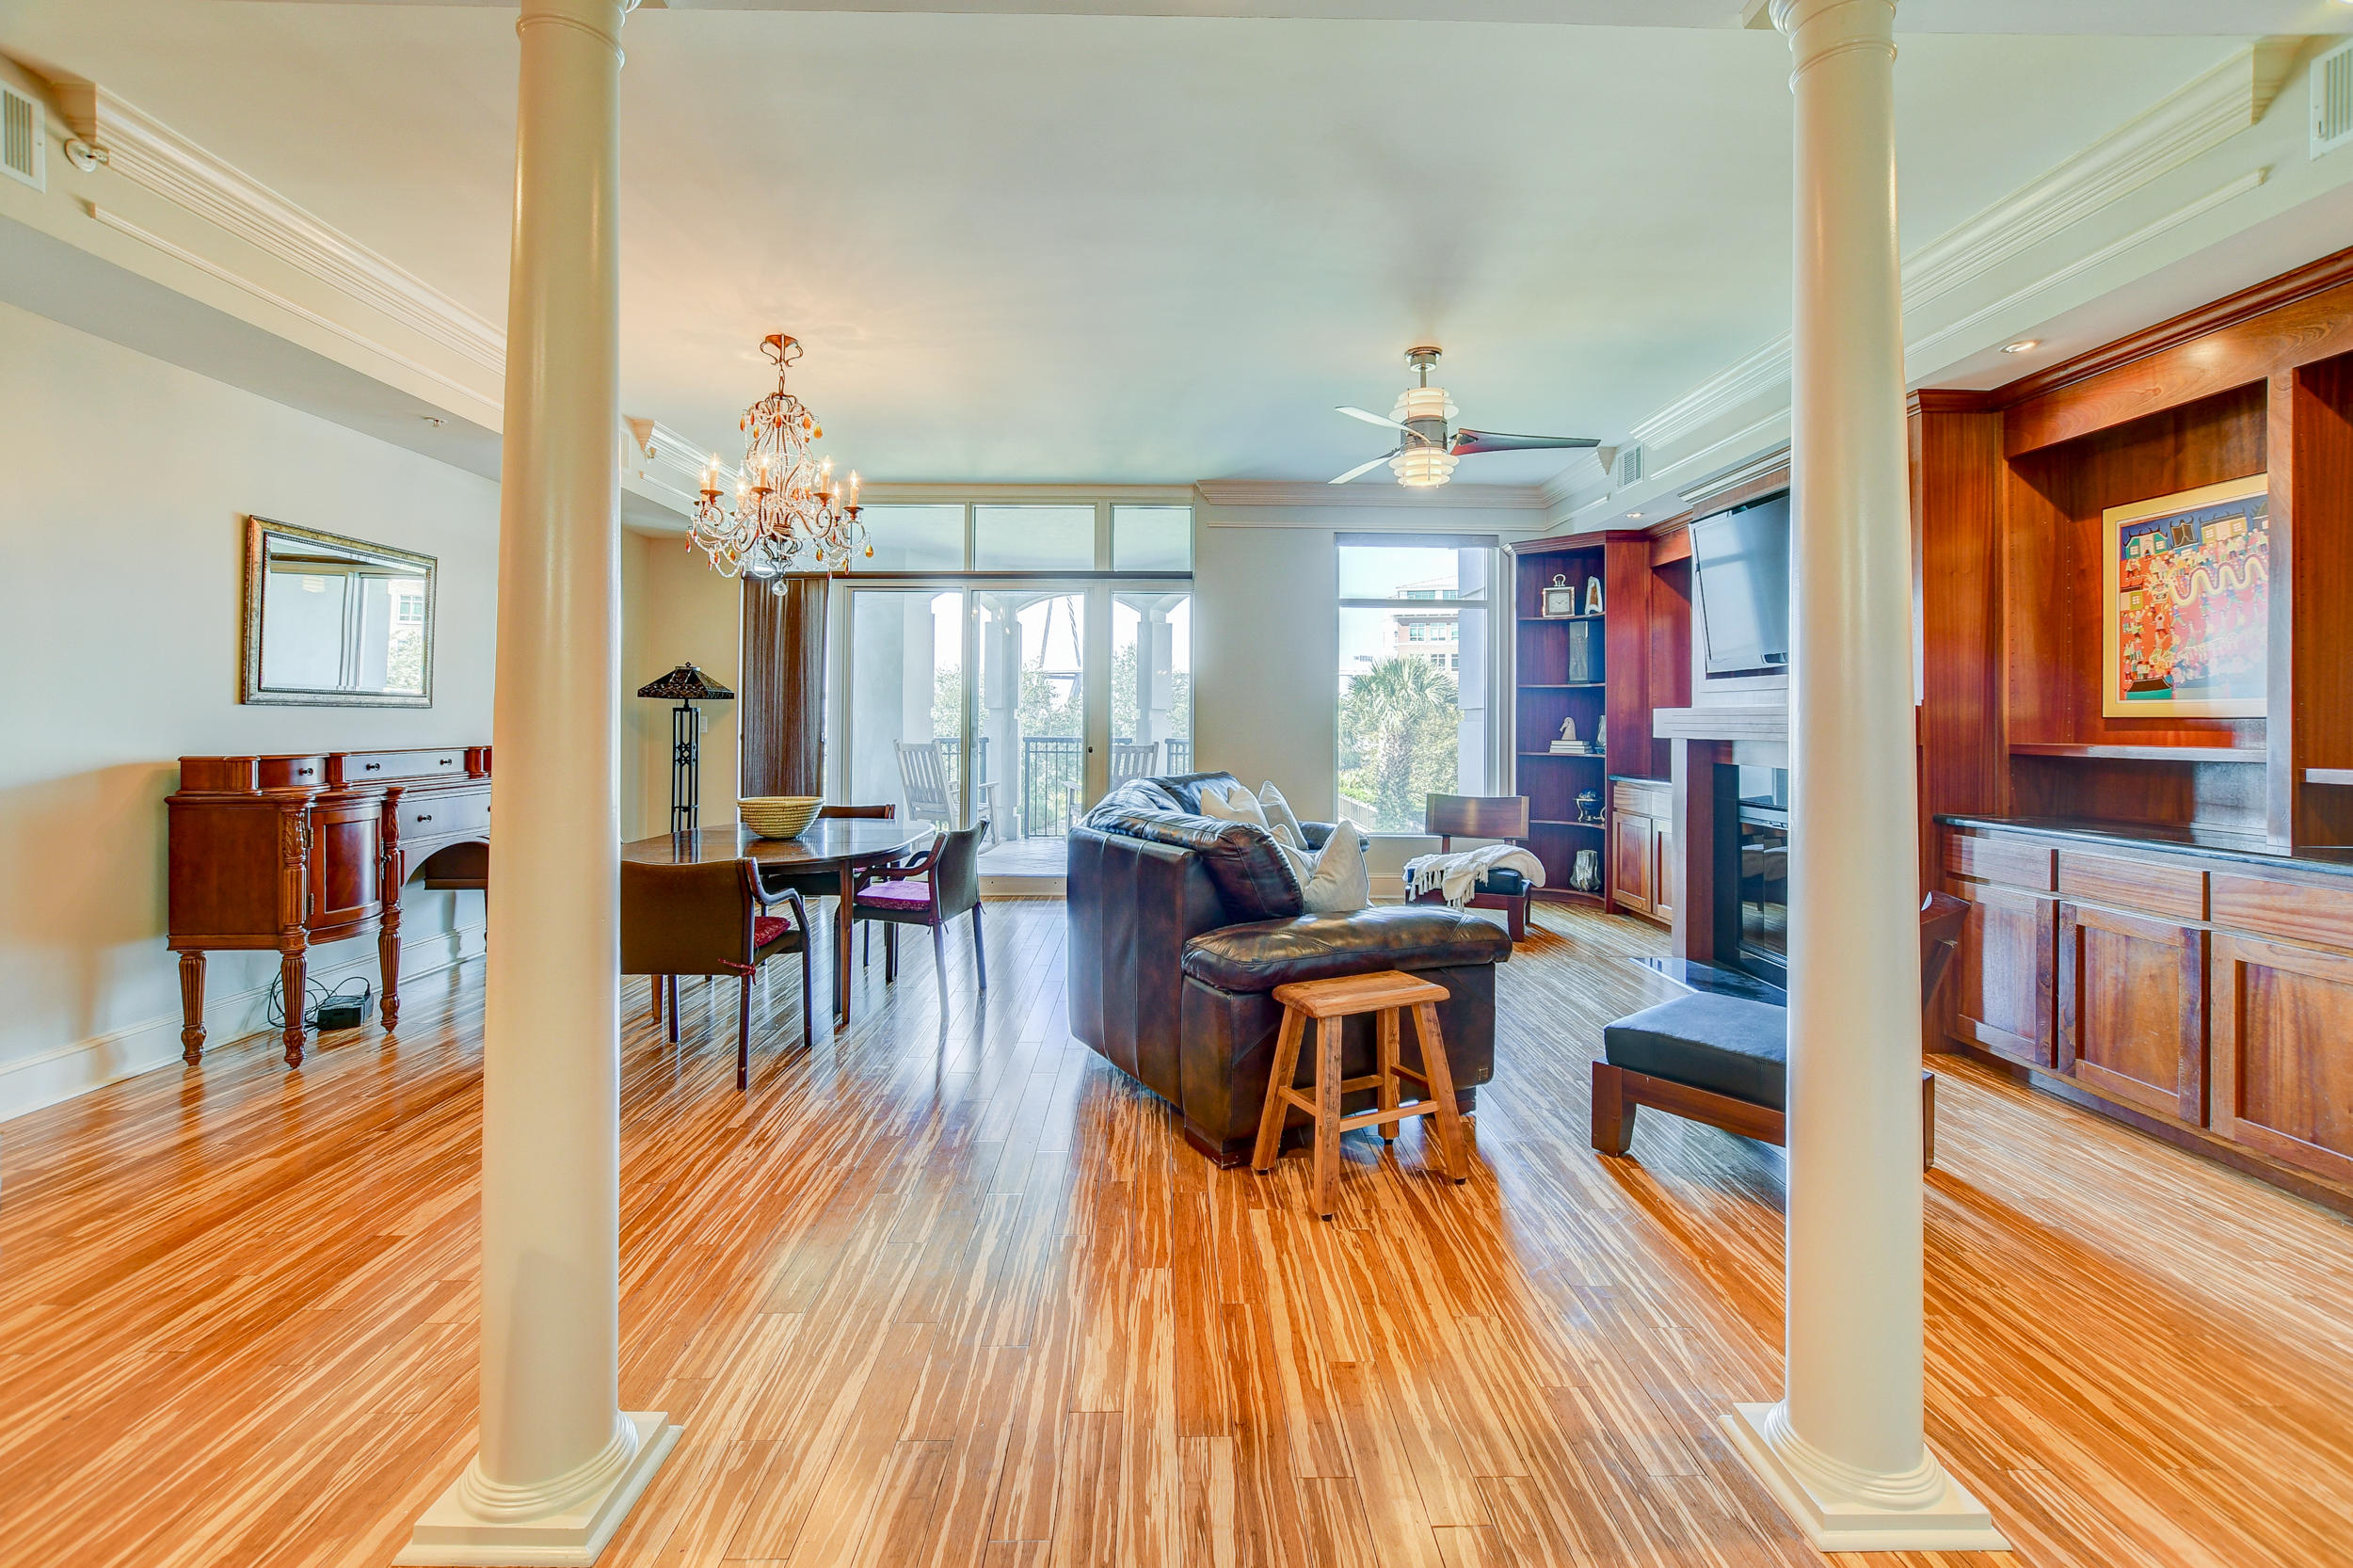 Renaissance On Chas Harbor Homes For Sale - 224 Plaza, Mount Pleasant, SC - 1